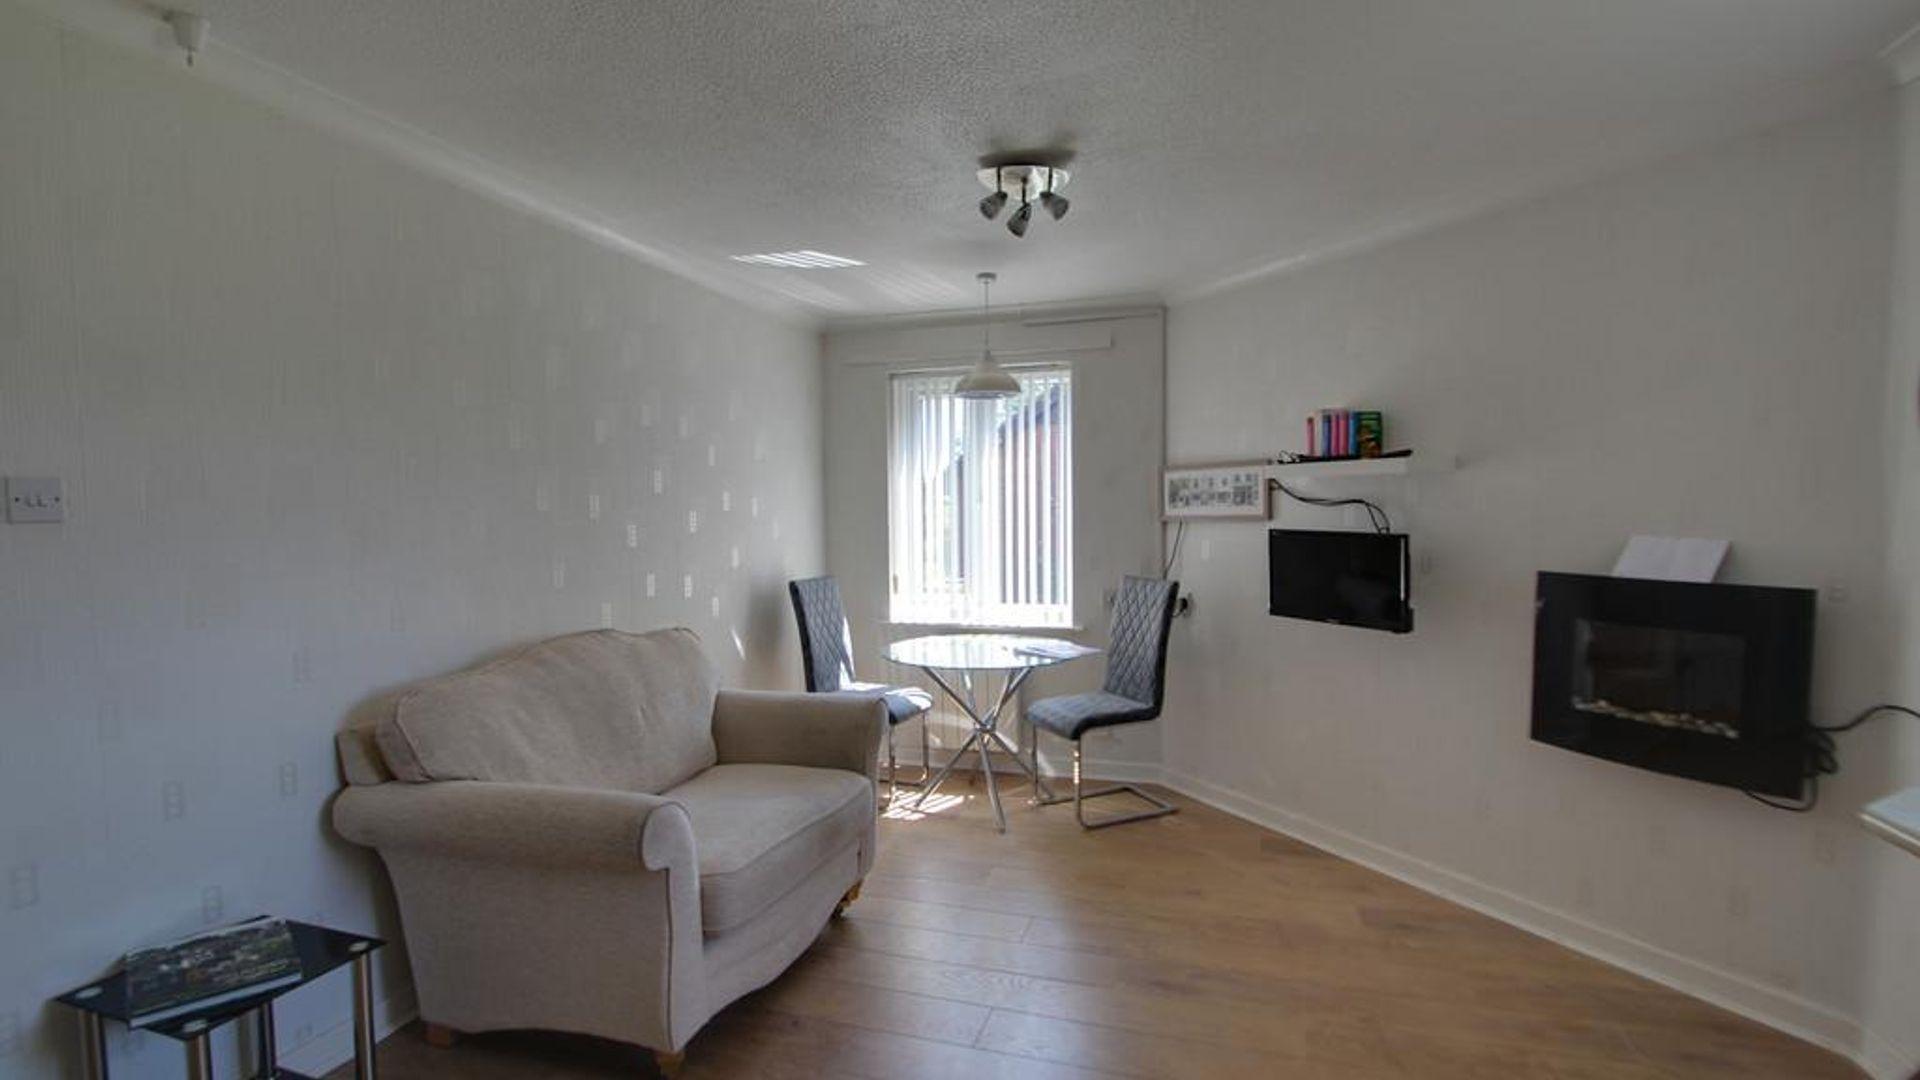 1-bed apartment at Glendale Farm, Botcheston LE9 9FG ...